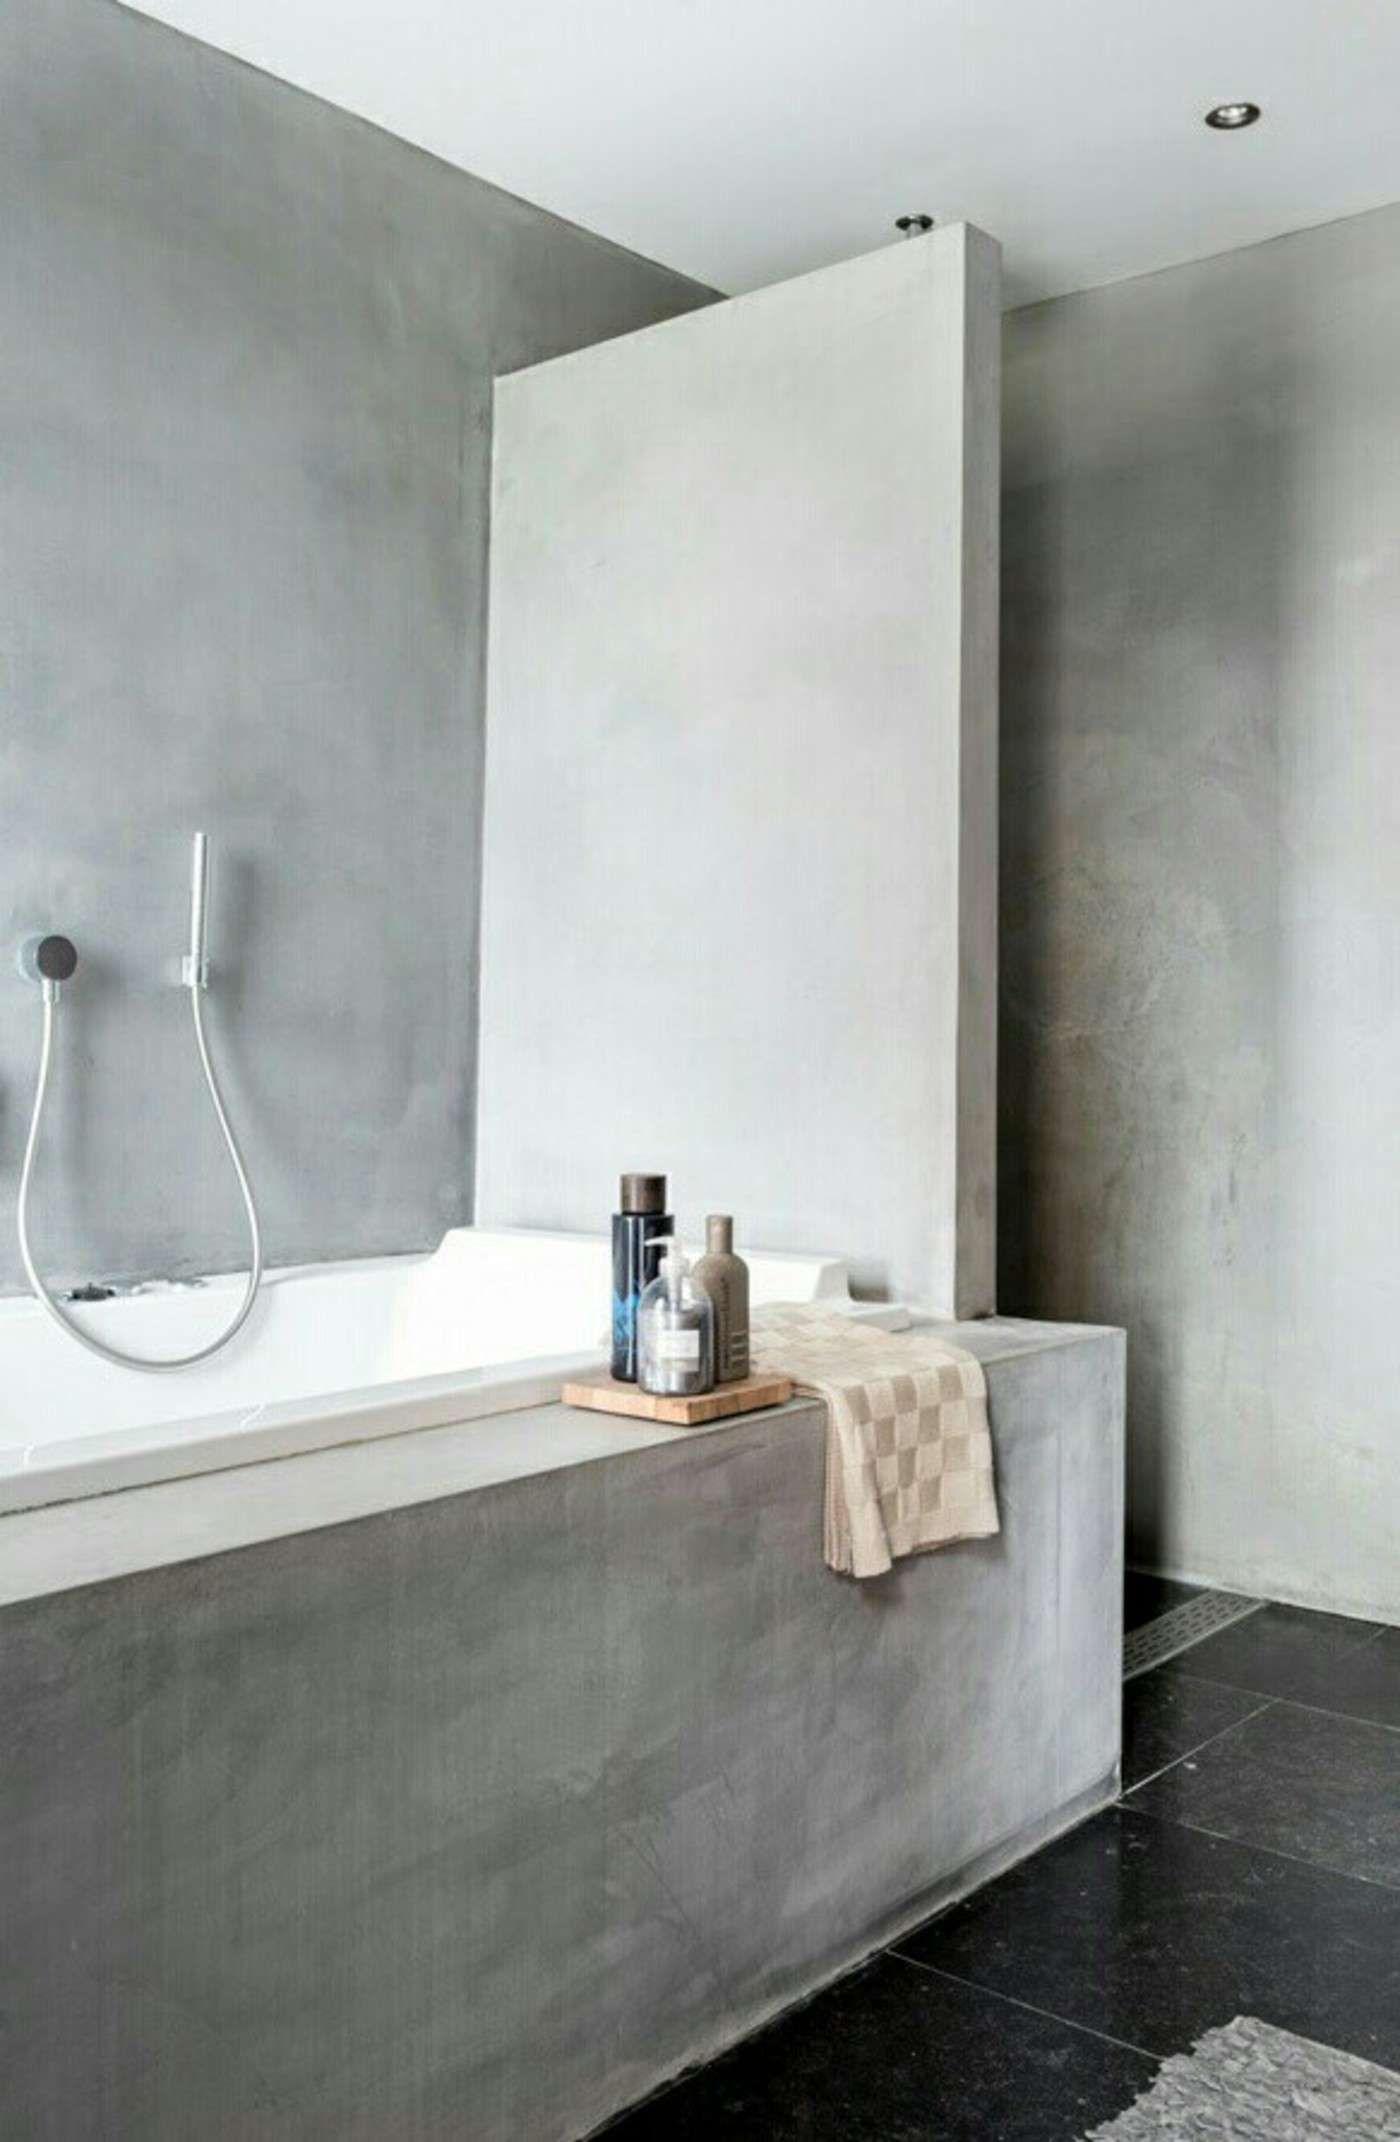 Trends Shaker | Concrete bathroom | Concrete and wood | Pinterest ...